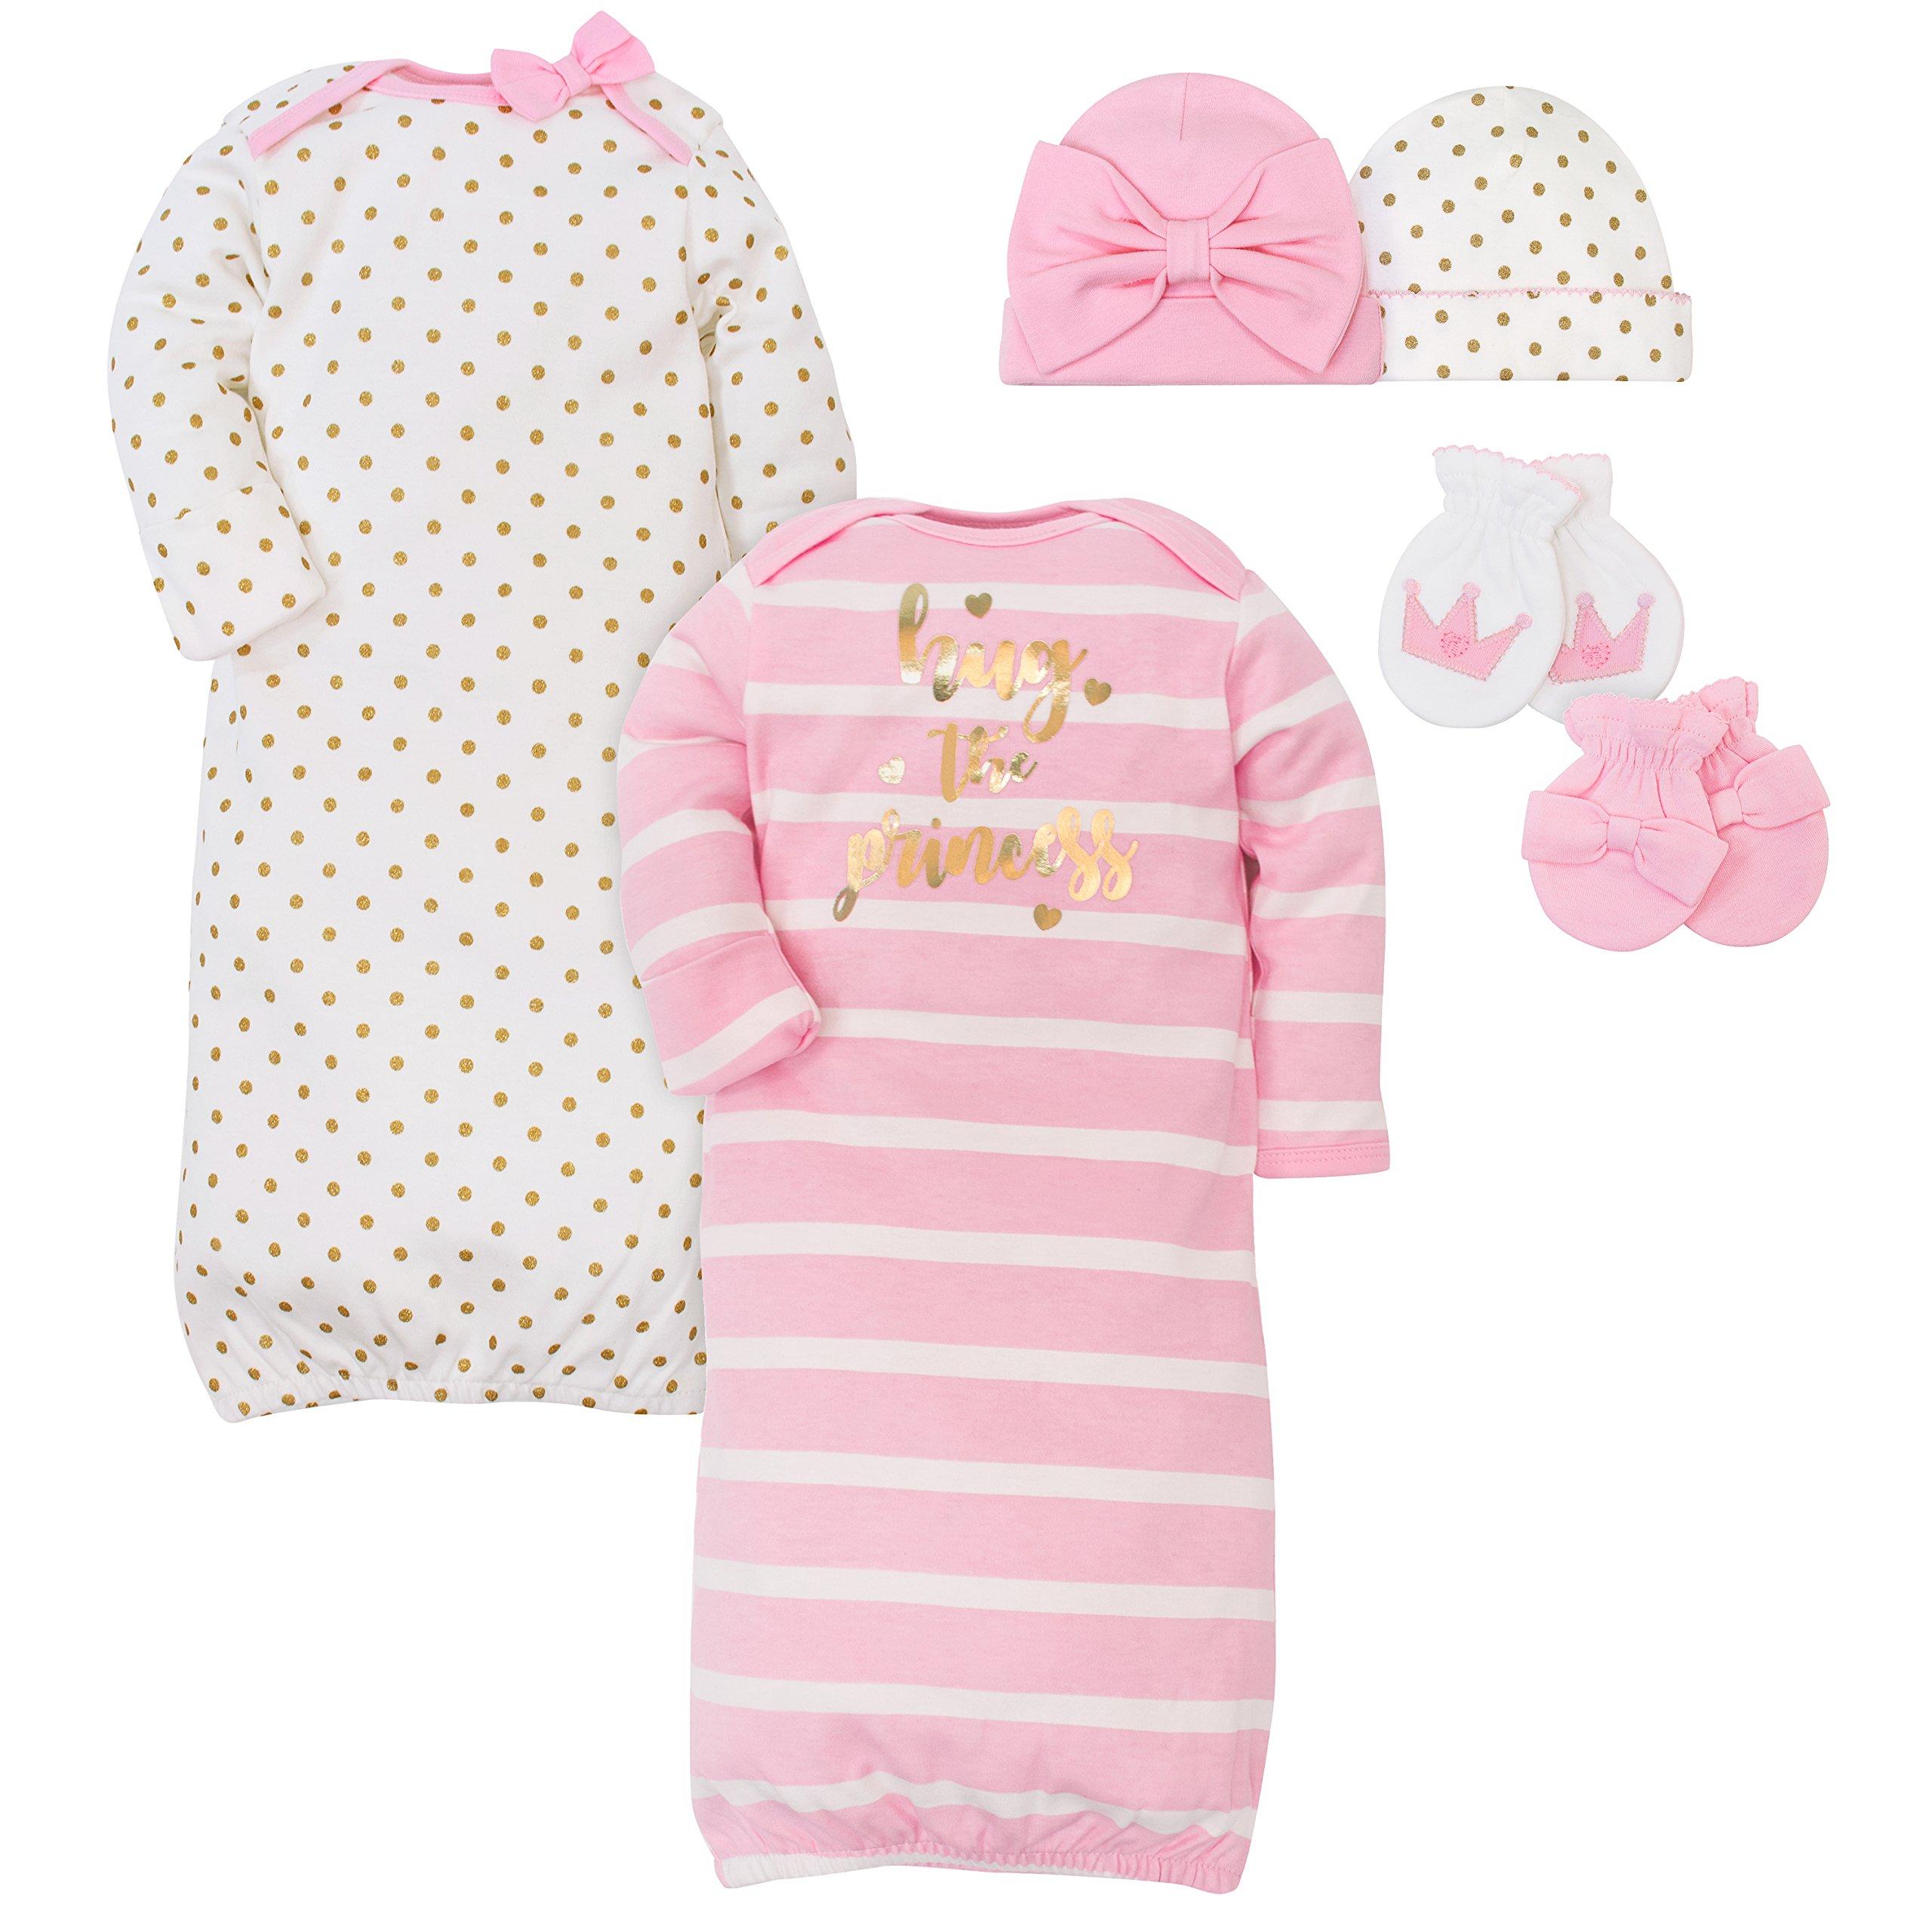 Gerber Baby Girls Layette Bundle, Princess, 0-6 Months